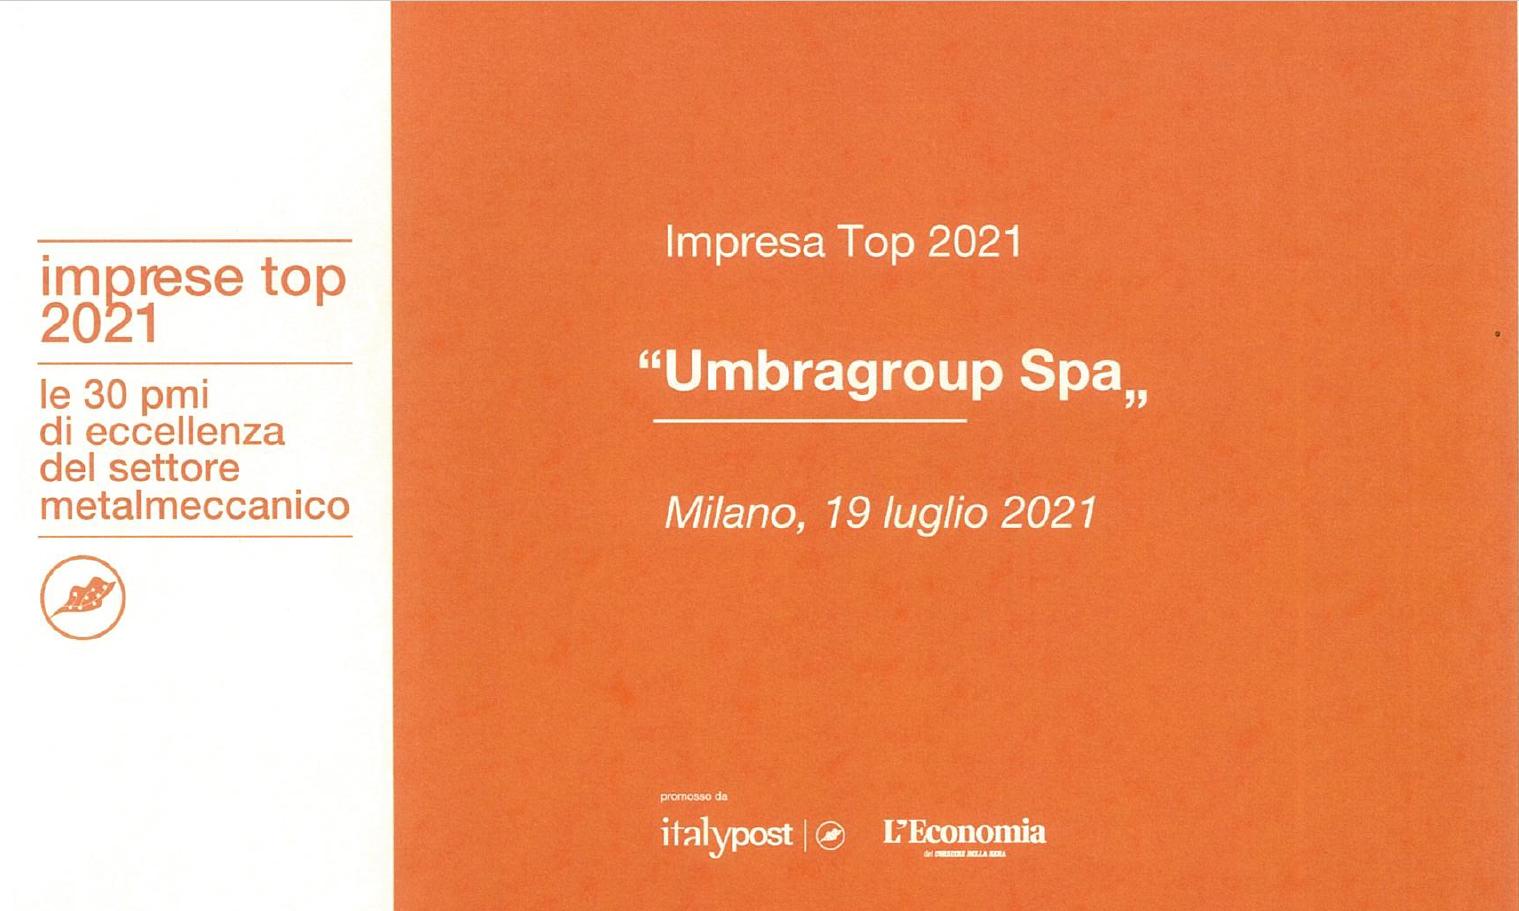 premio impresa top 20211